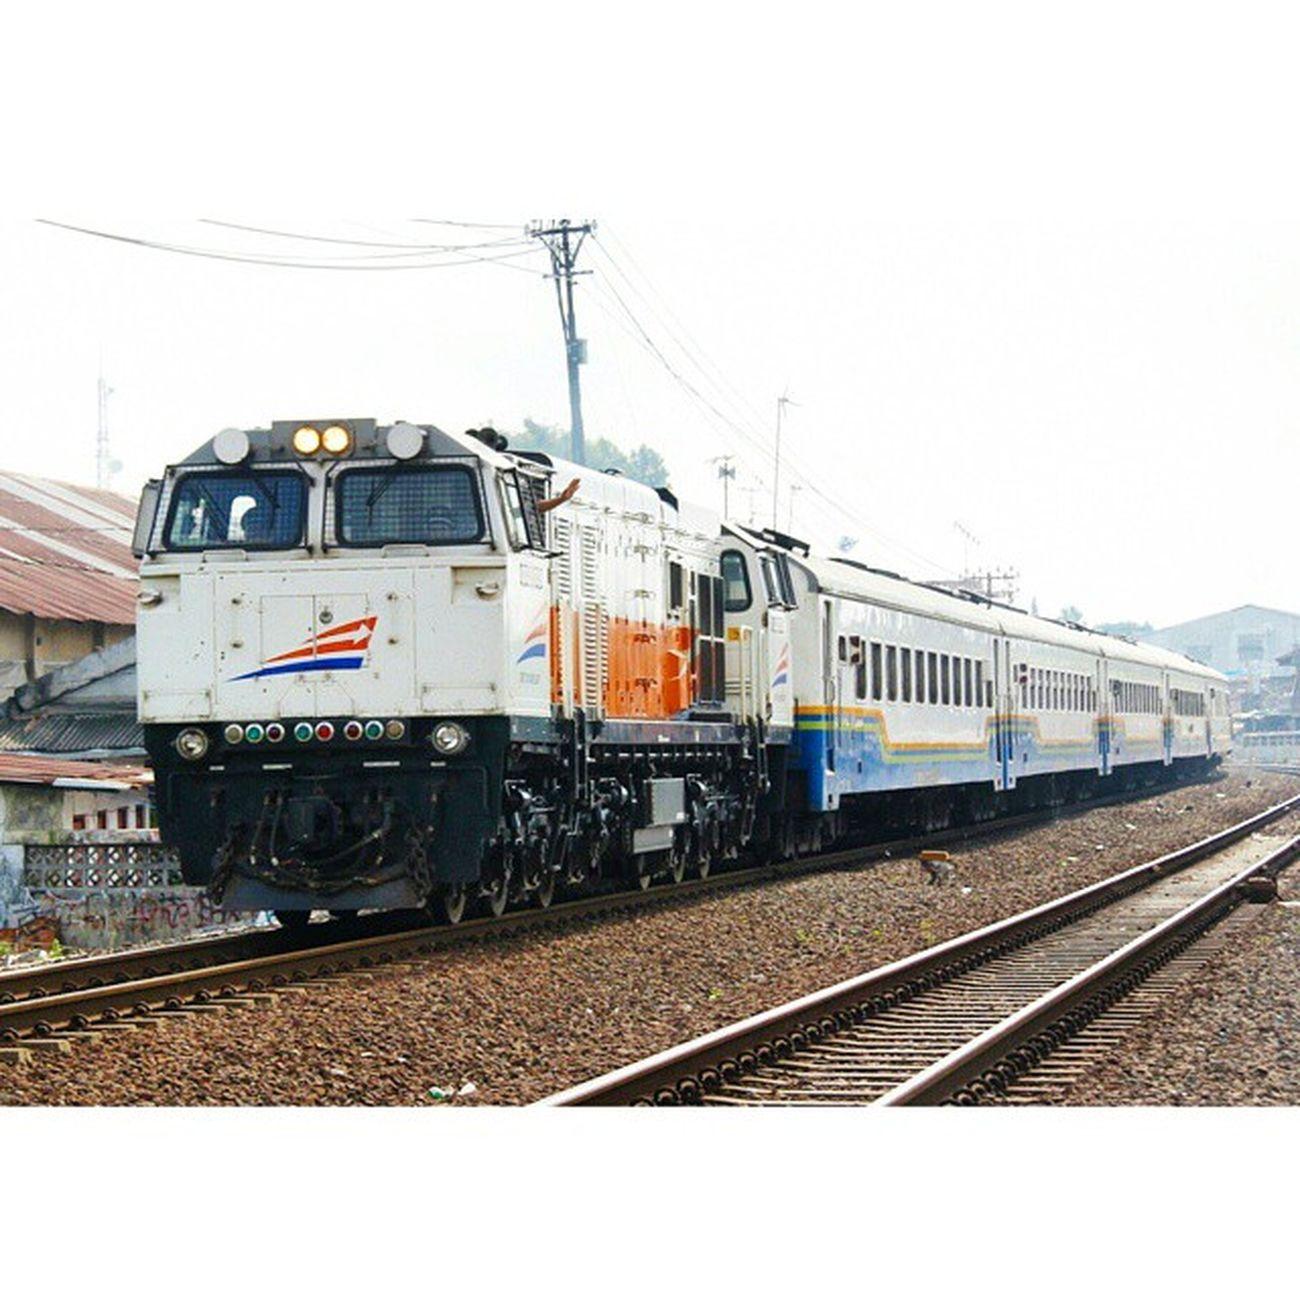 Stasiun Tugu Yogyakarta, lambaian tangan sang masinis @keretaapikita Railfans Railway Railwayphotography Rail spoor ptkai keretaapi yogyakarta keretaapikita EventInstaKAI Februari2